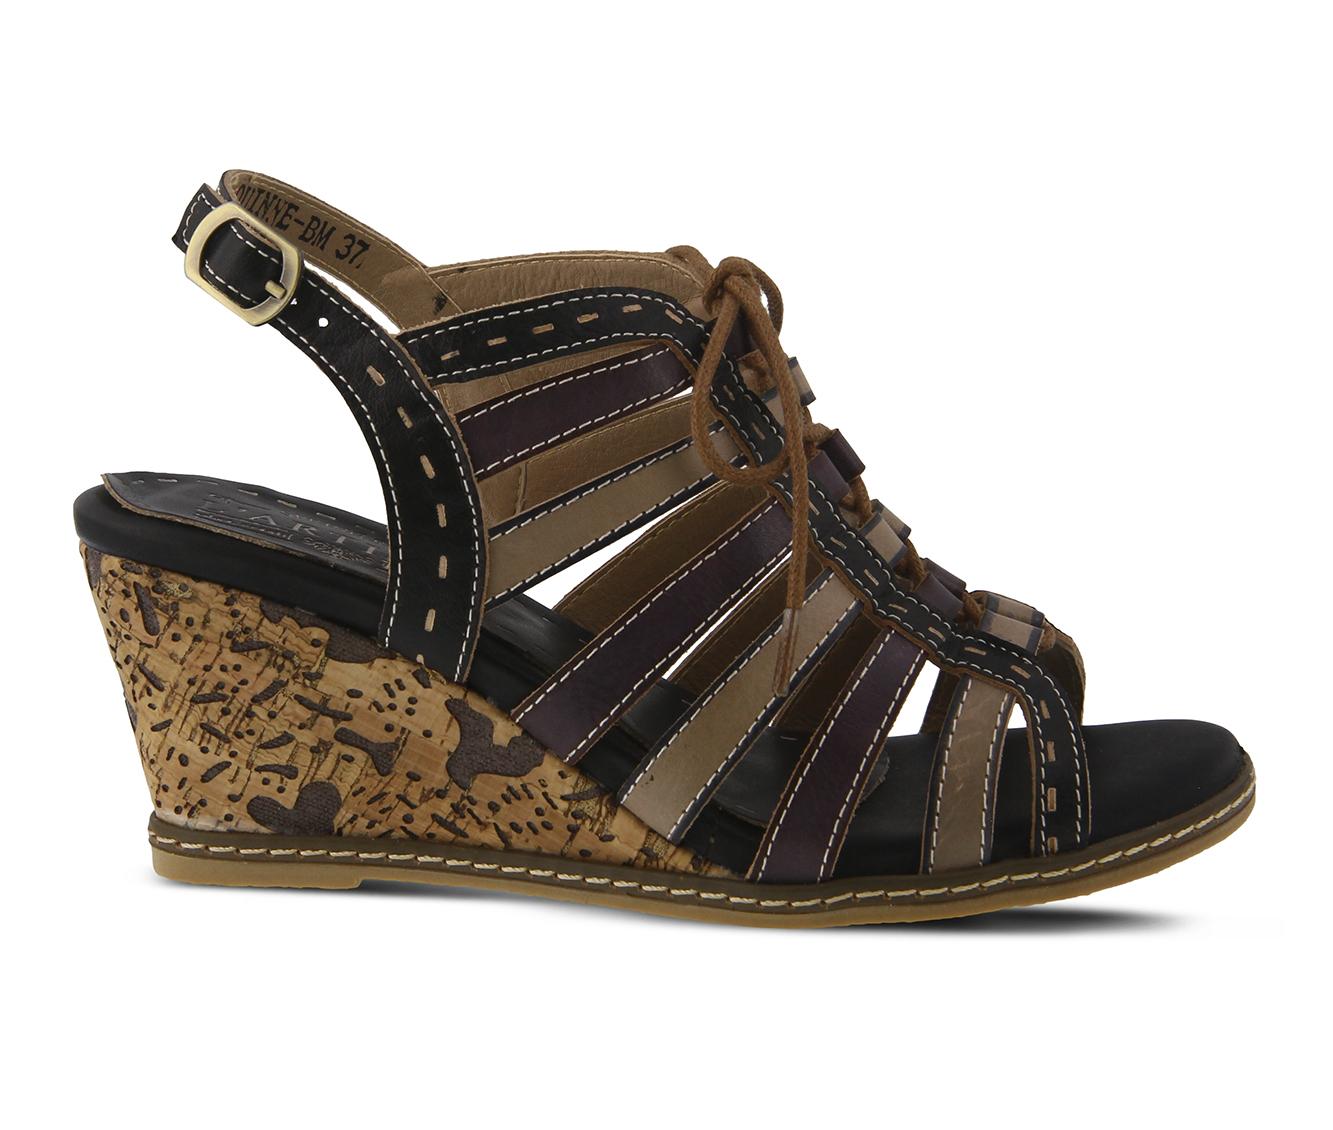 L'Artiste Quinne Women's Dress Shoe (Black Leather)